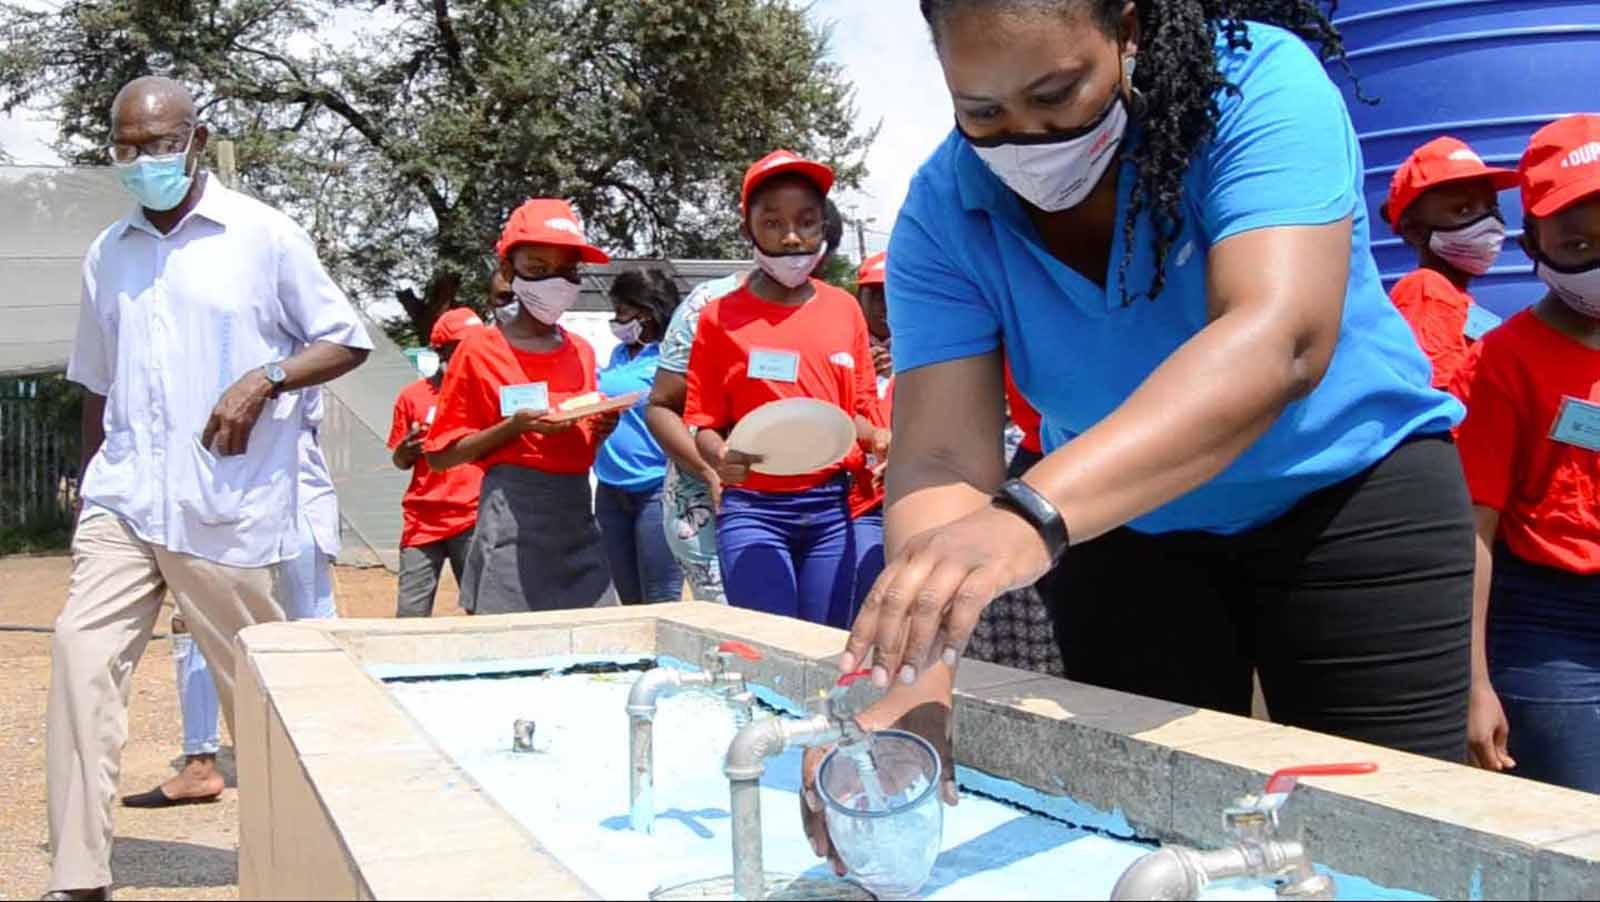 Temba Water Woes - People Can't Drink Sludge